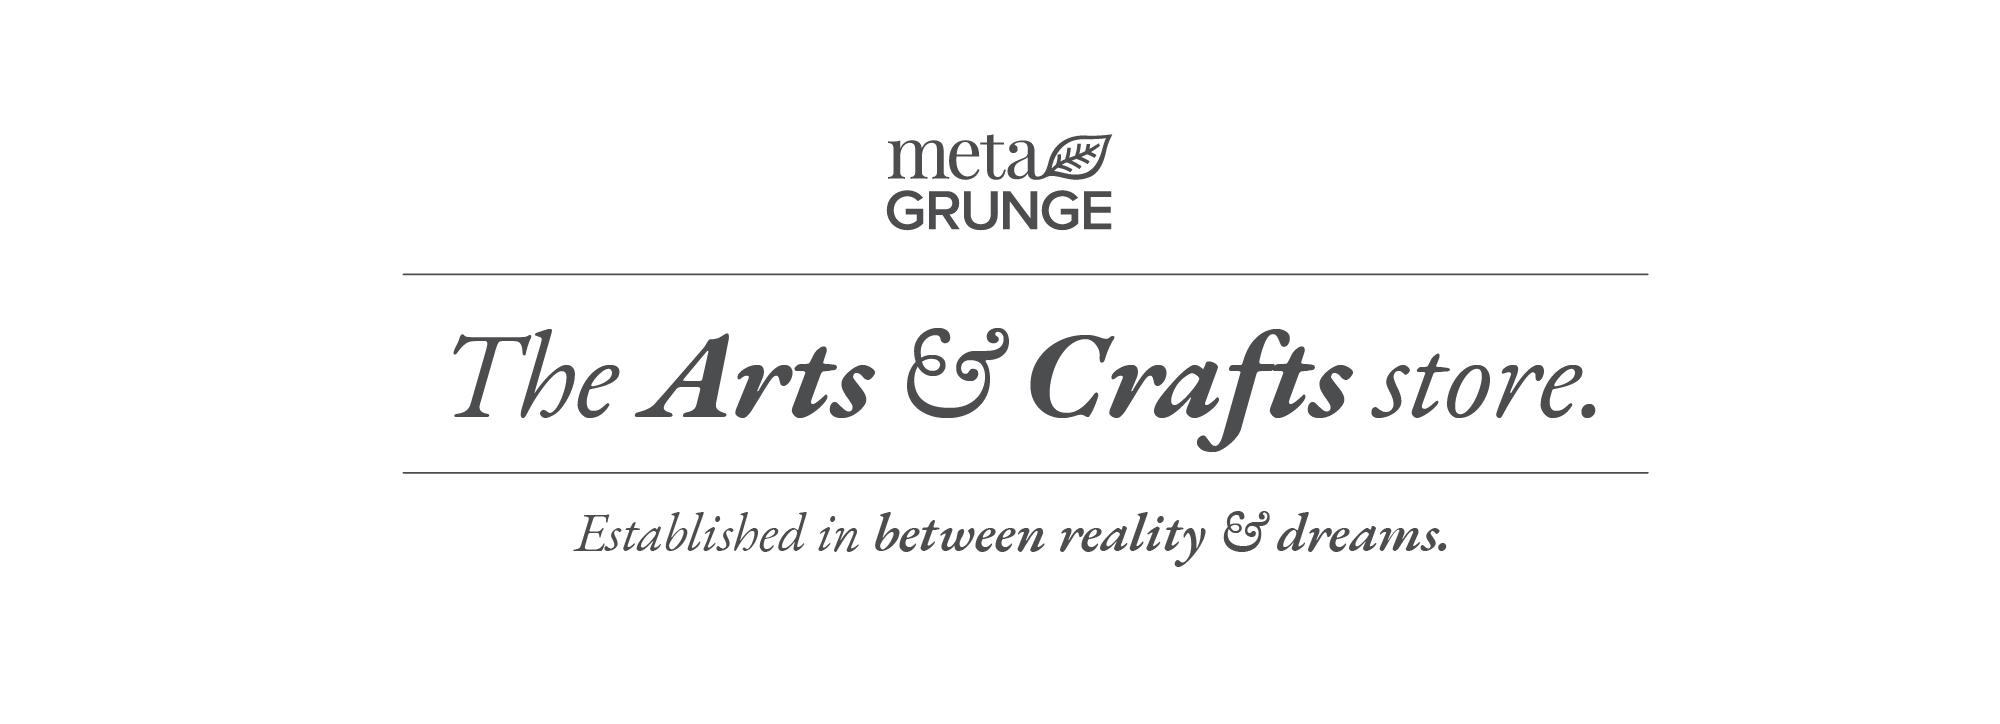 MetagrungeArtsCrafts